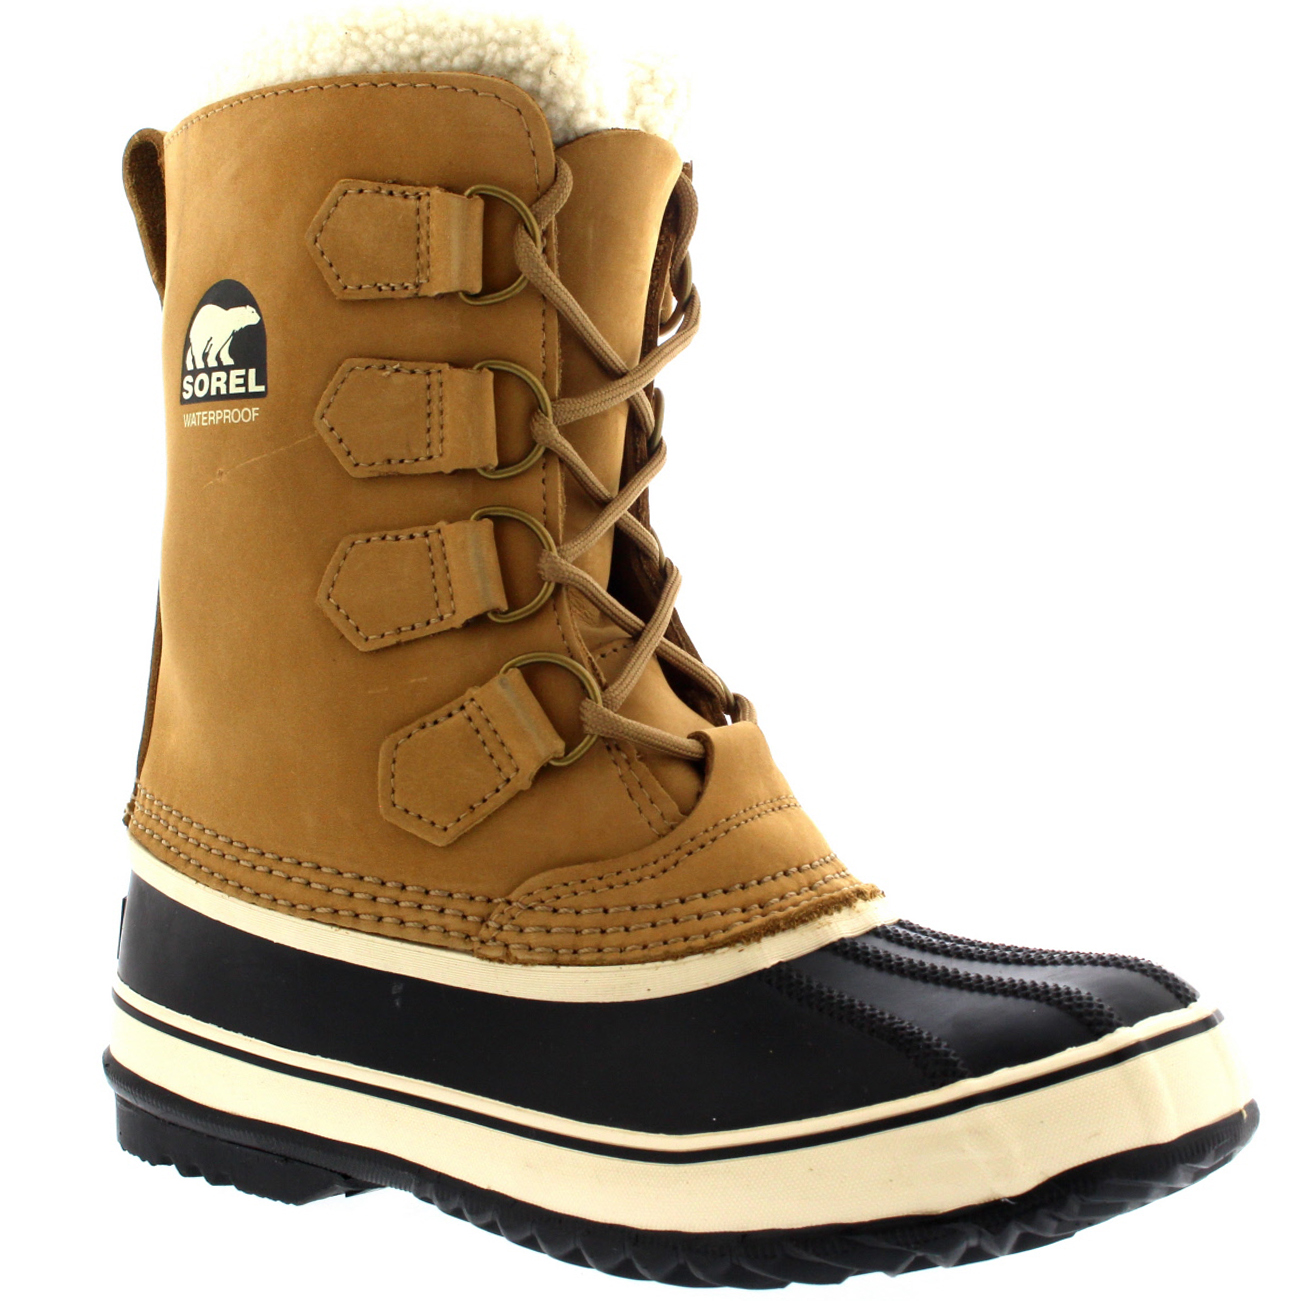 womens shoes|mens shoes|: women shoes mens shoes ecommerce, open source, shop, online shopping.